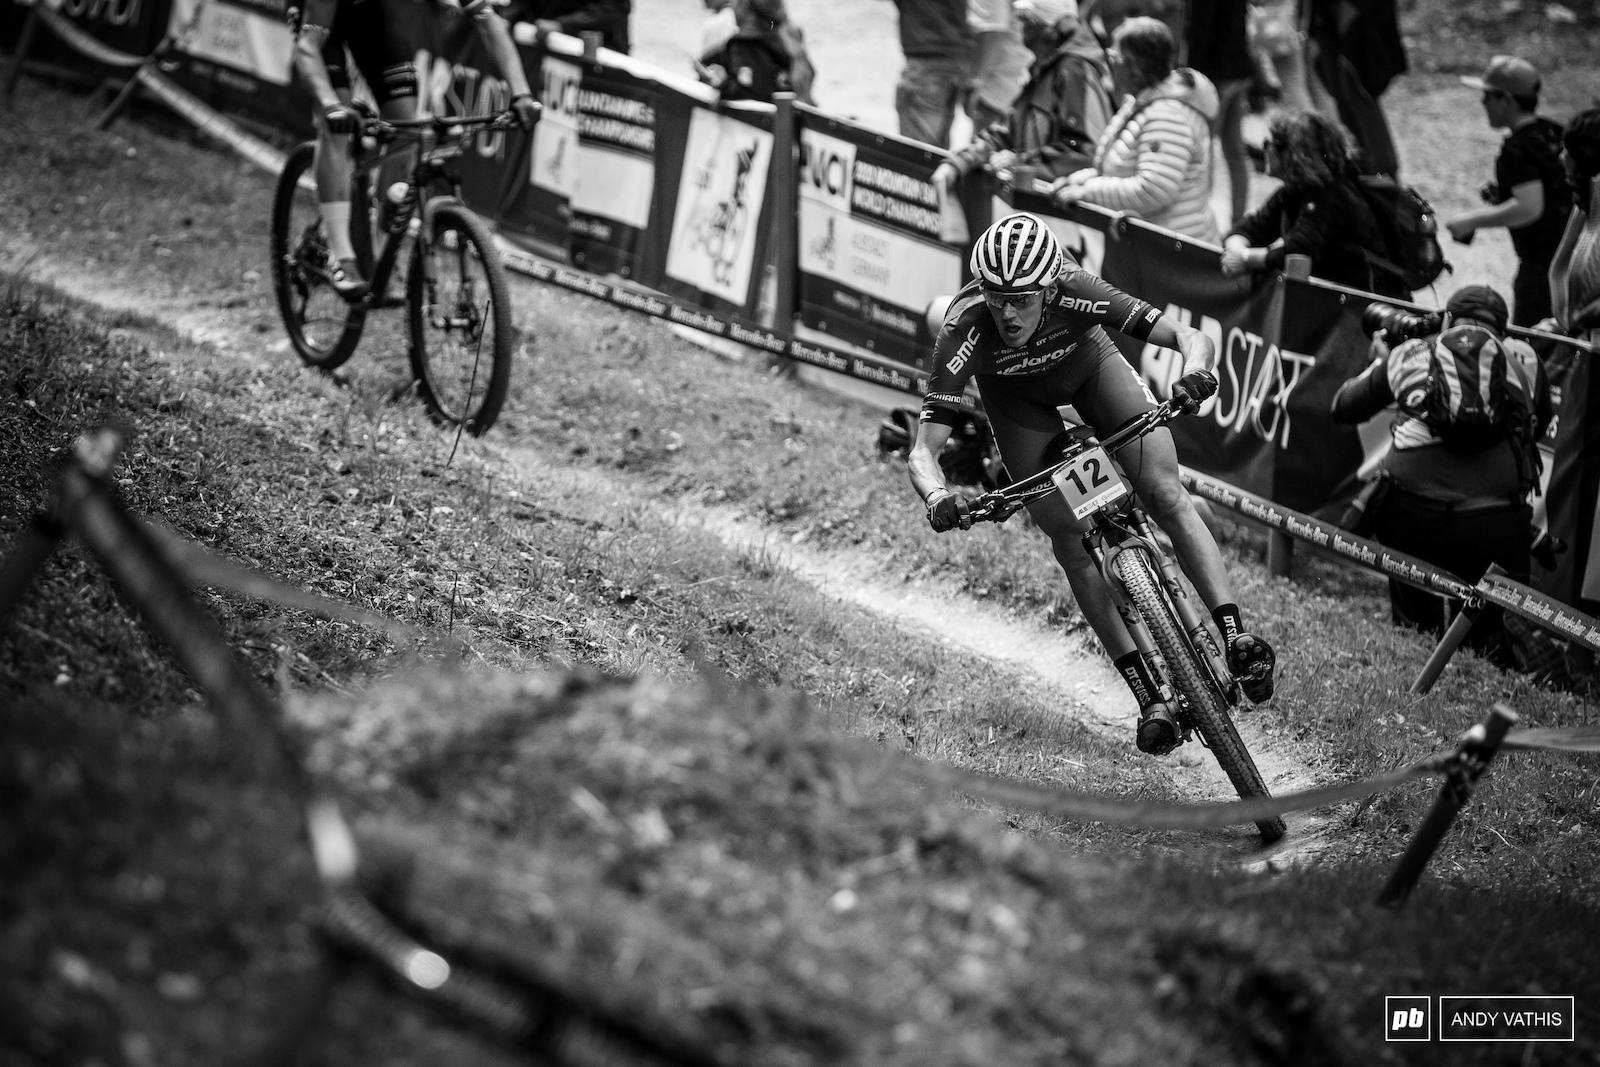 Antoine Philipp crushing the single track.